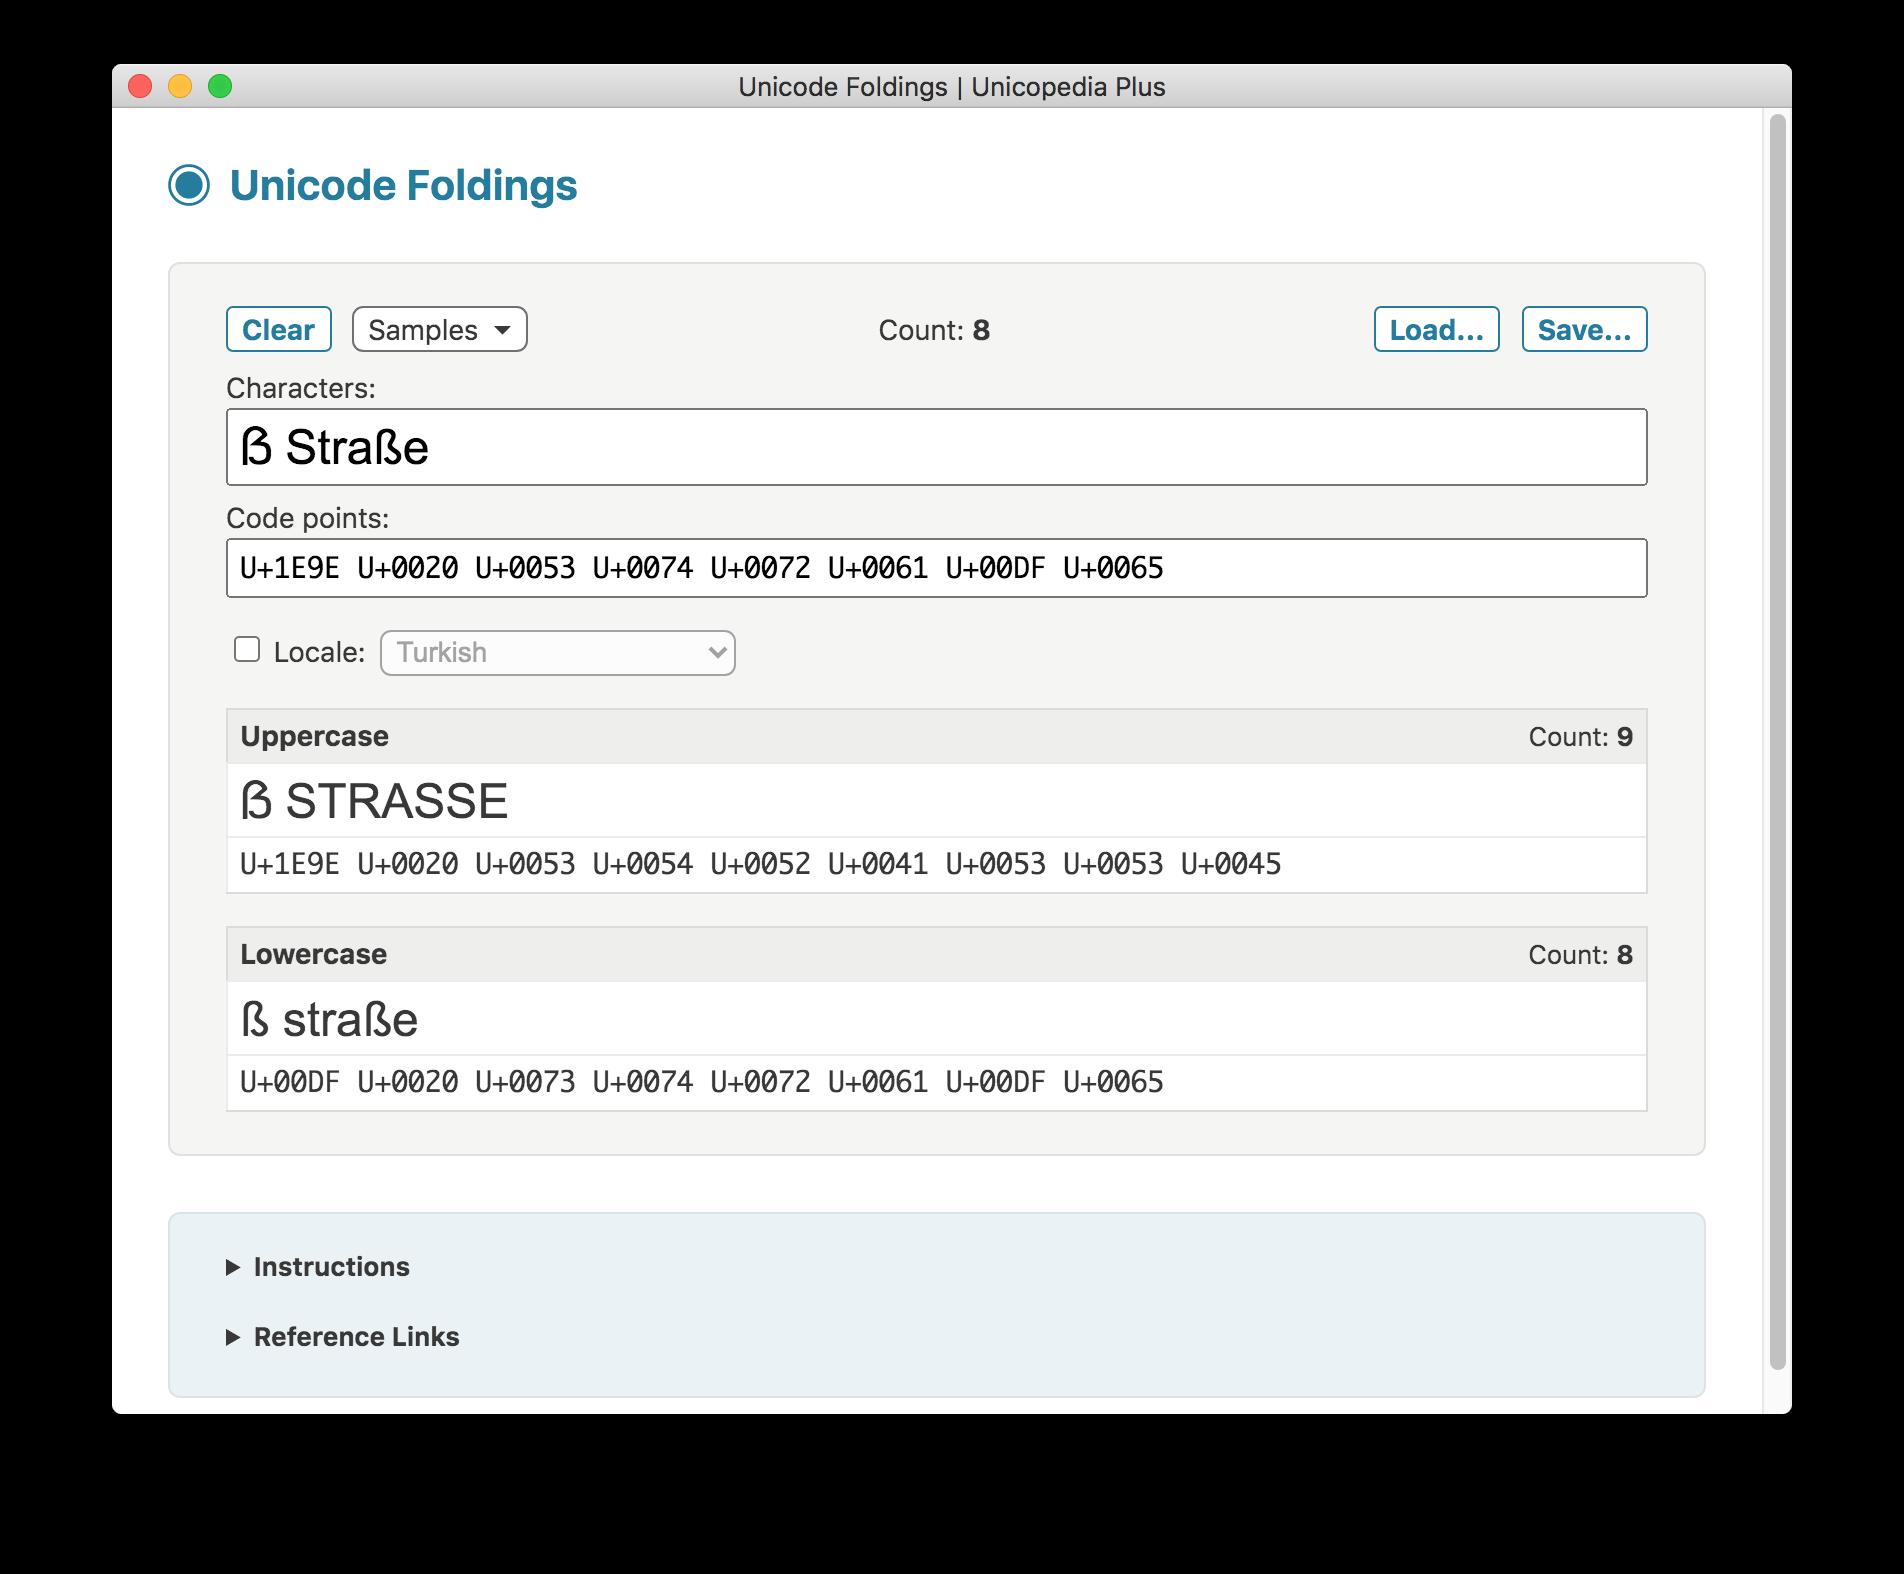 Unicode Foldings screenshot